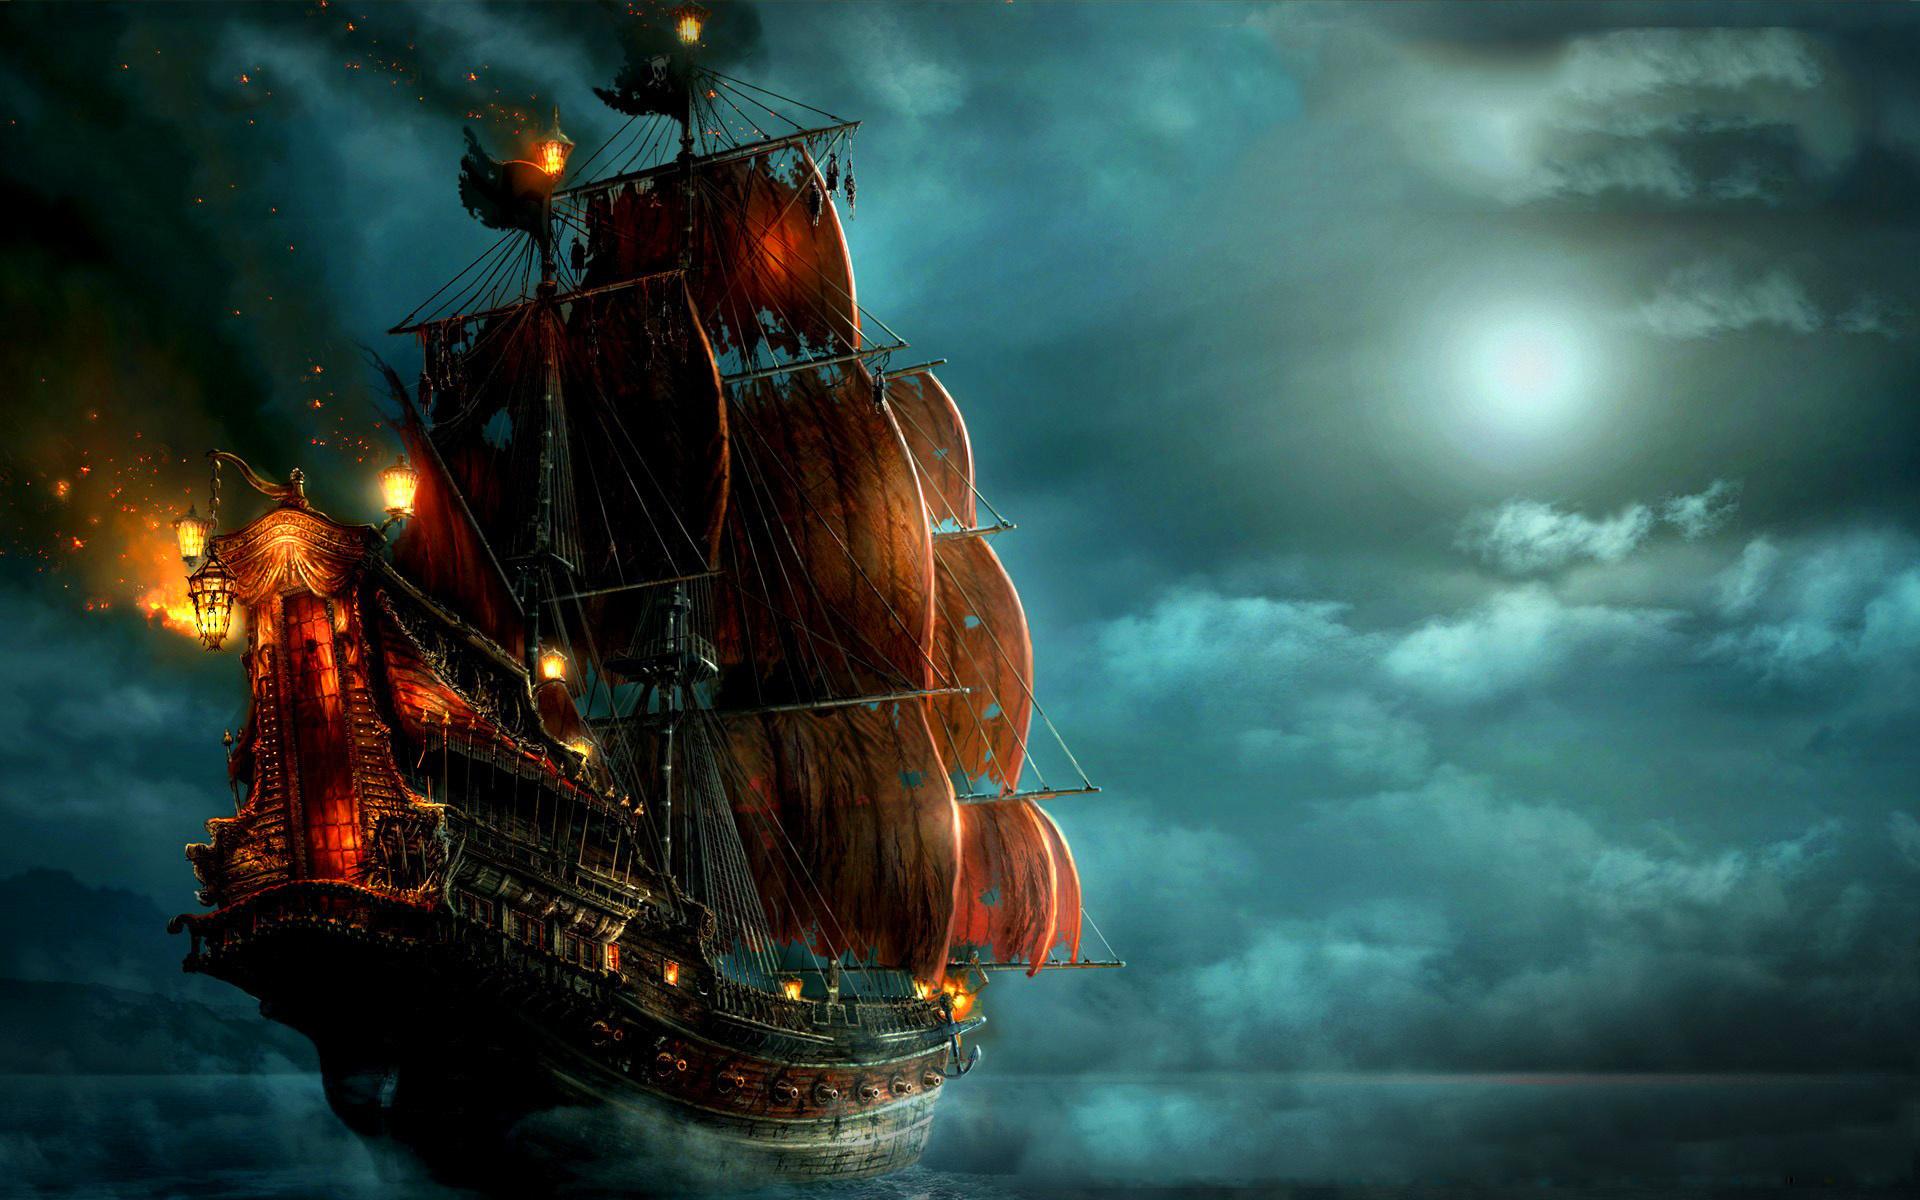 Пиратский корабль картинки - 0105